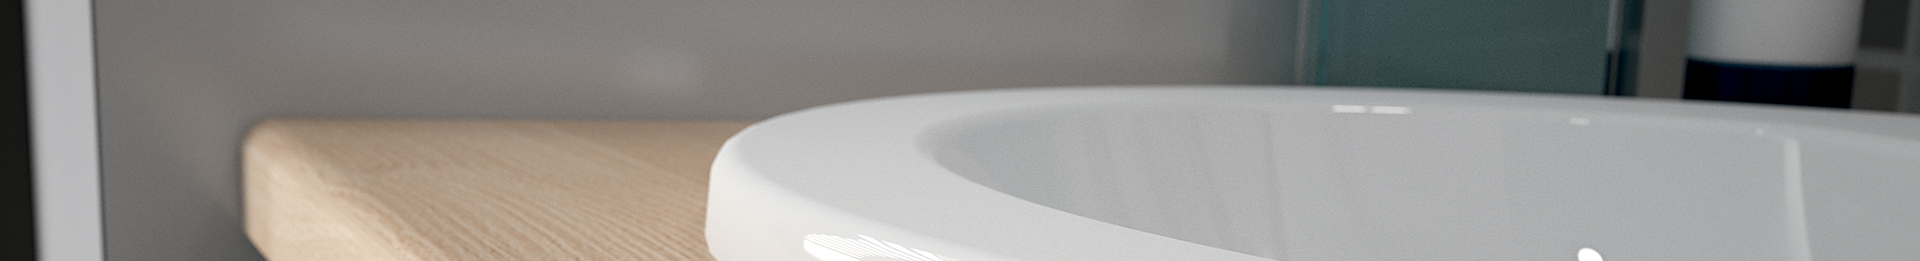 Plan de toilette salle de bain